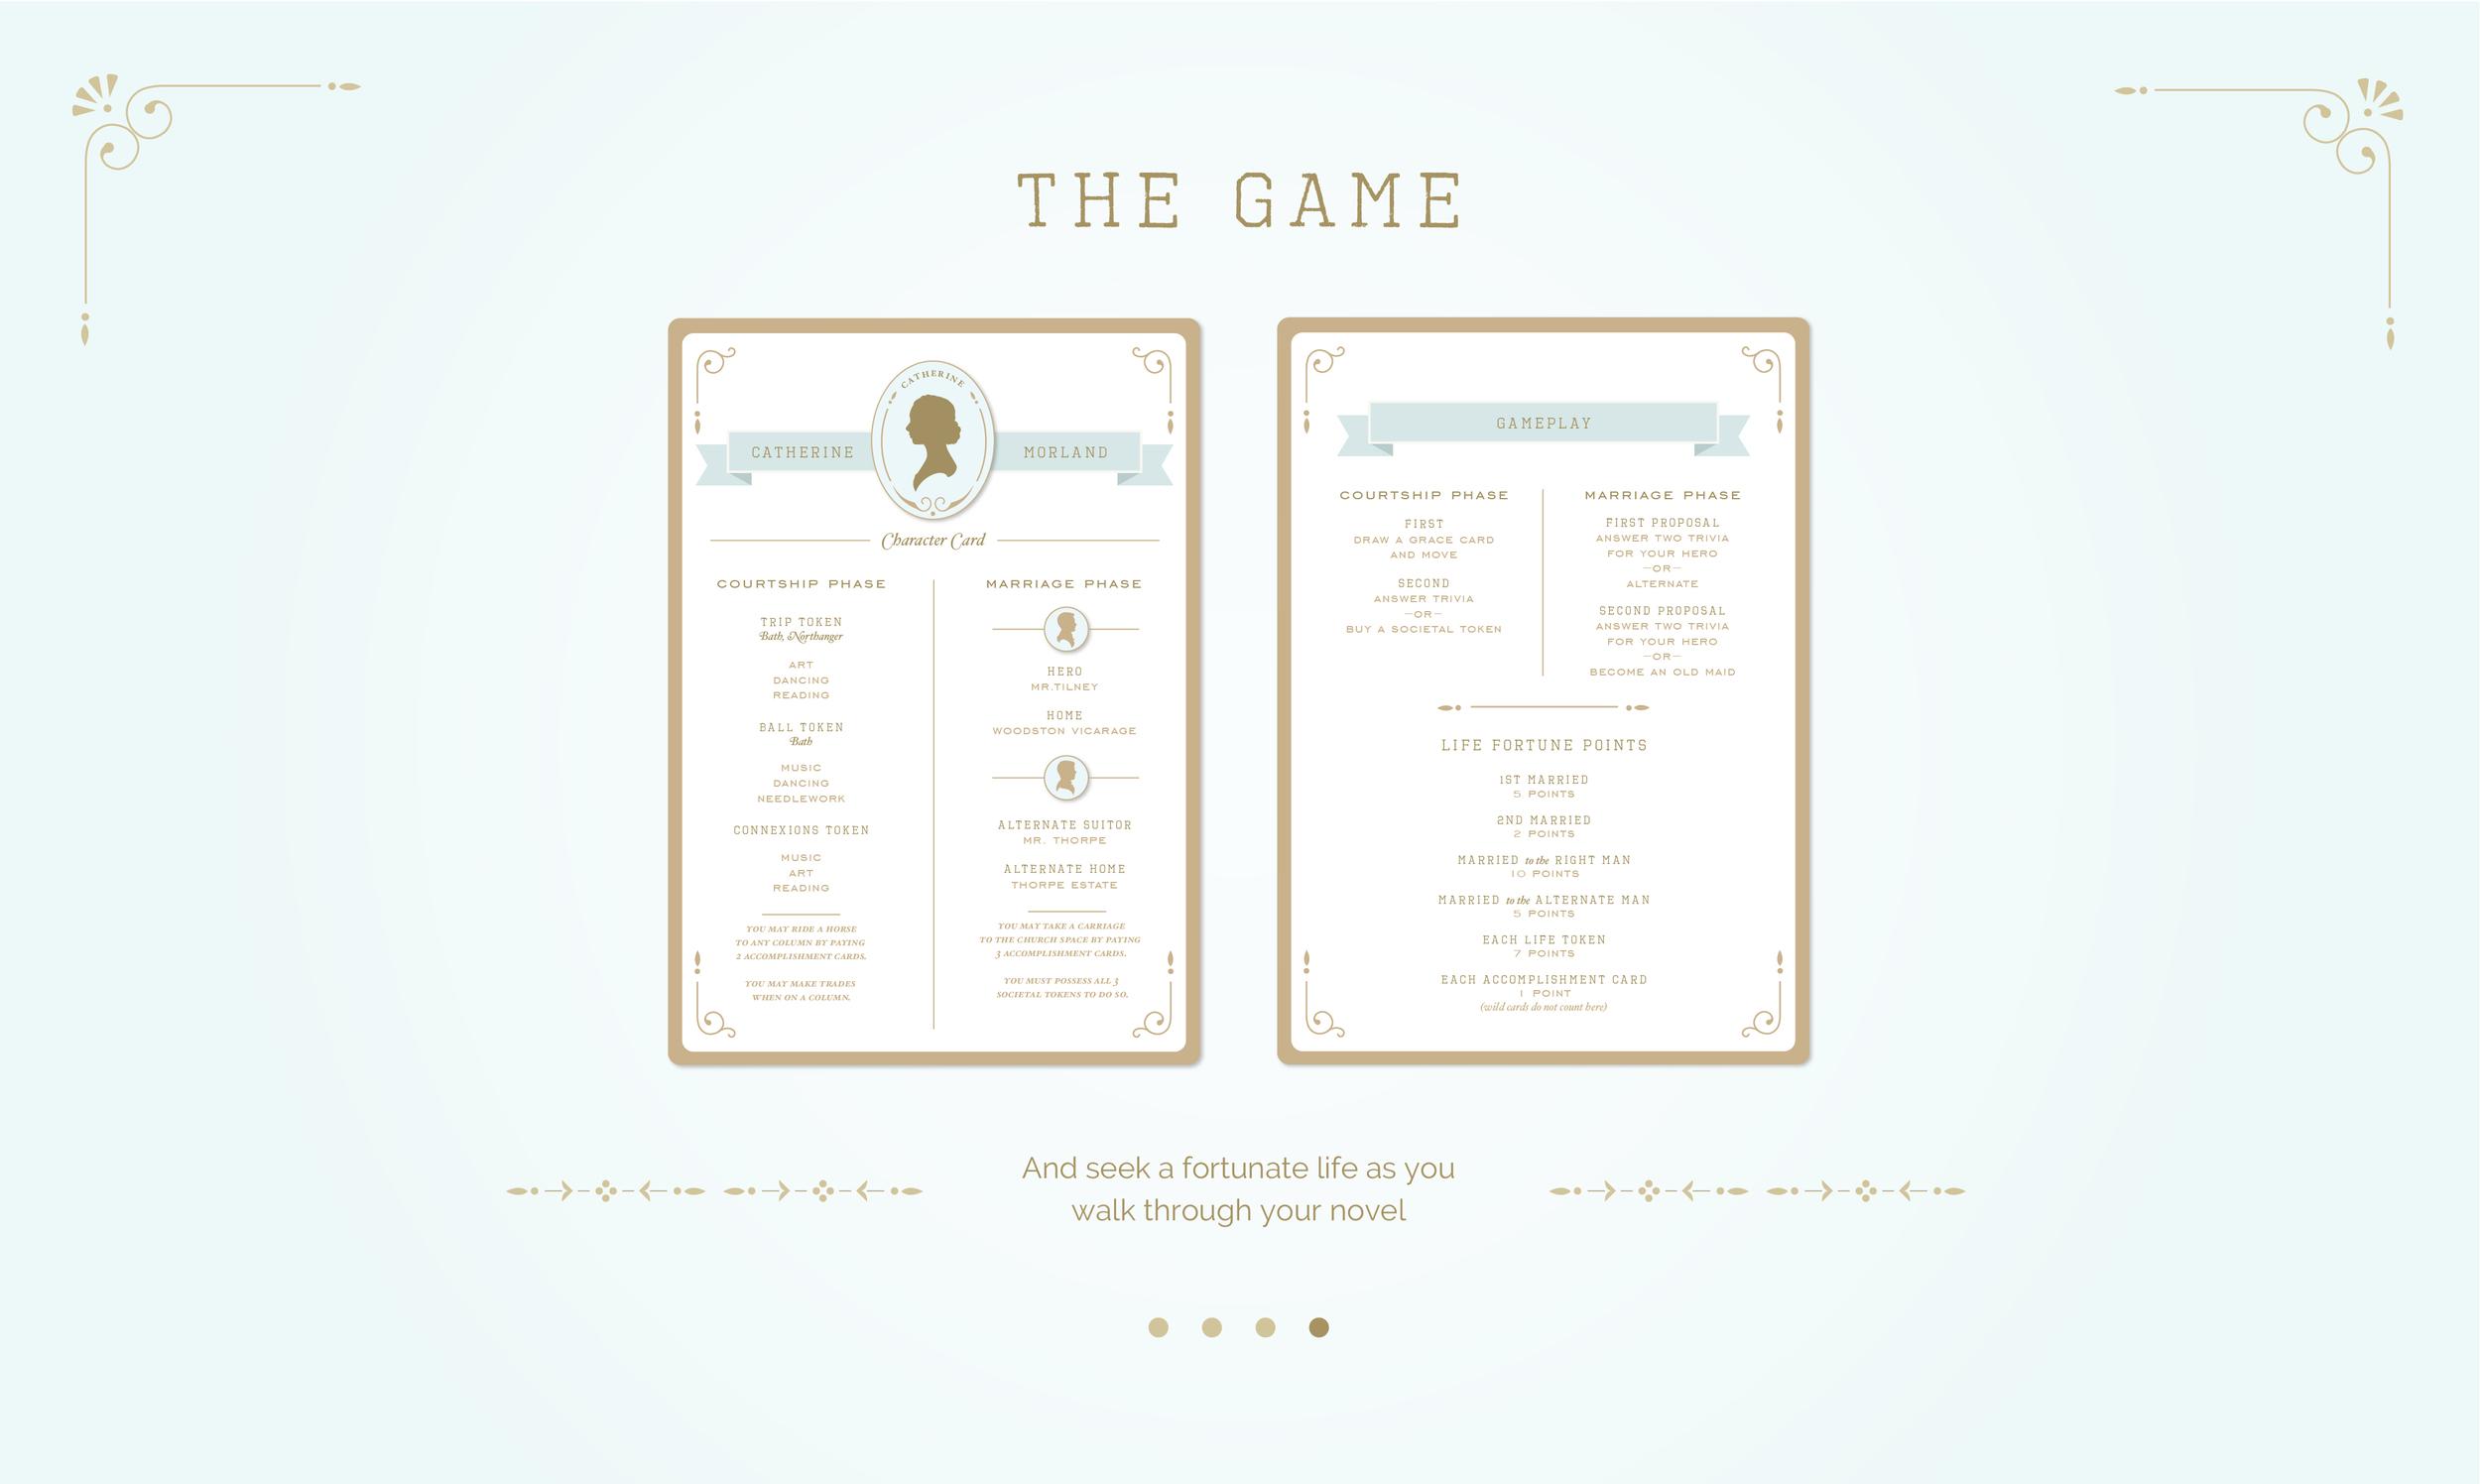 The_Jane_Game_Jane_Austen_Game1.4.jpg